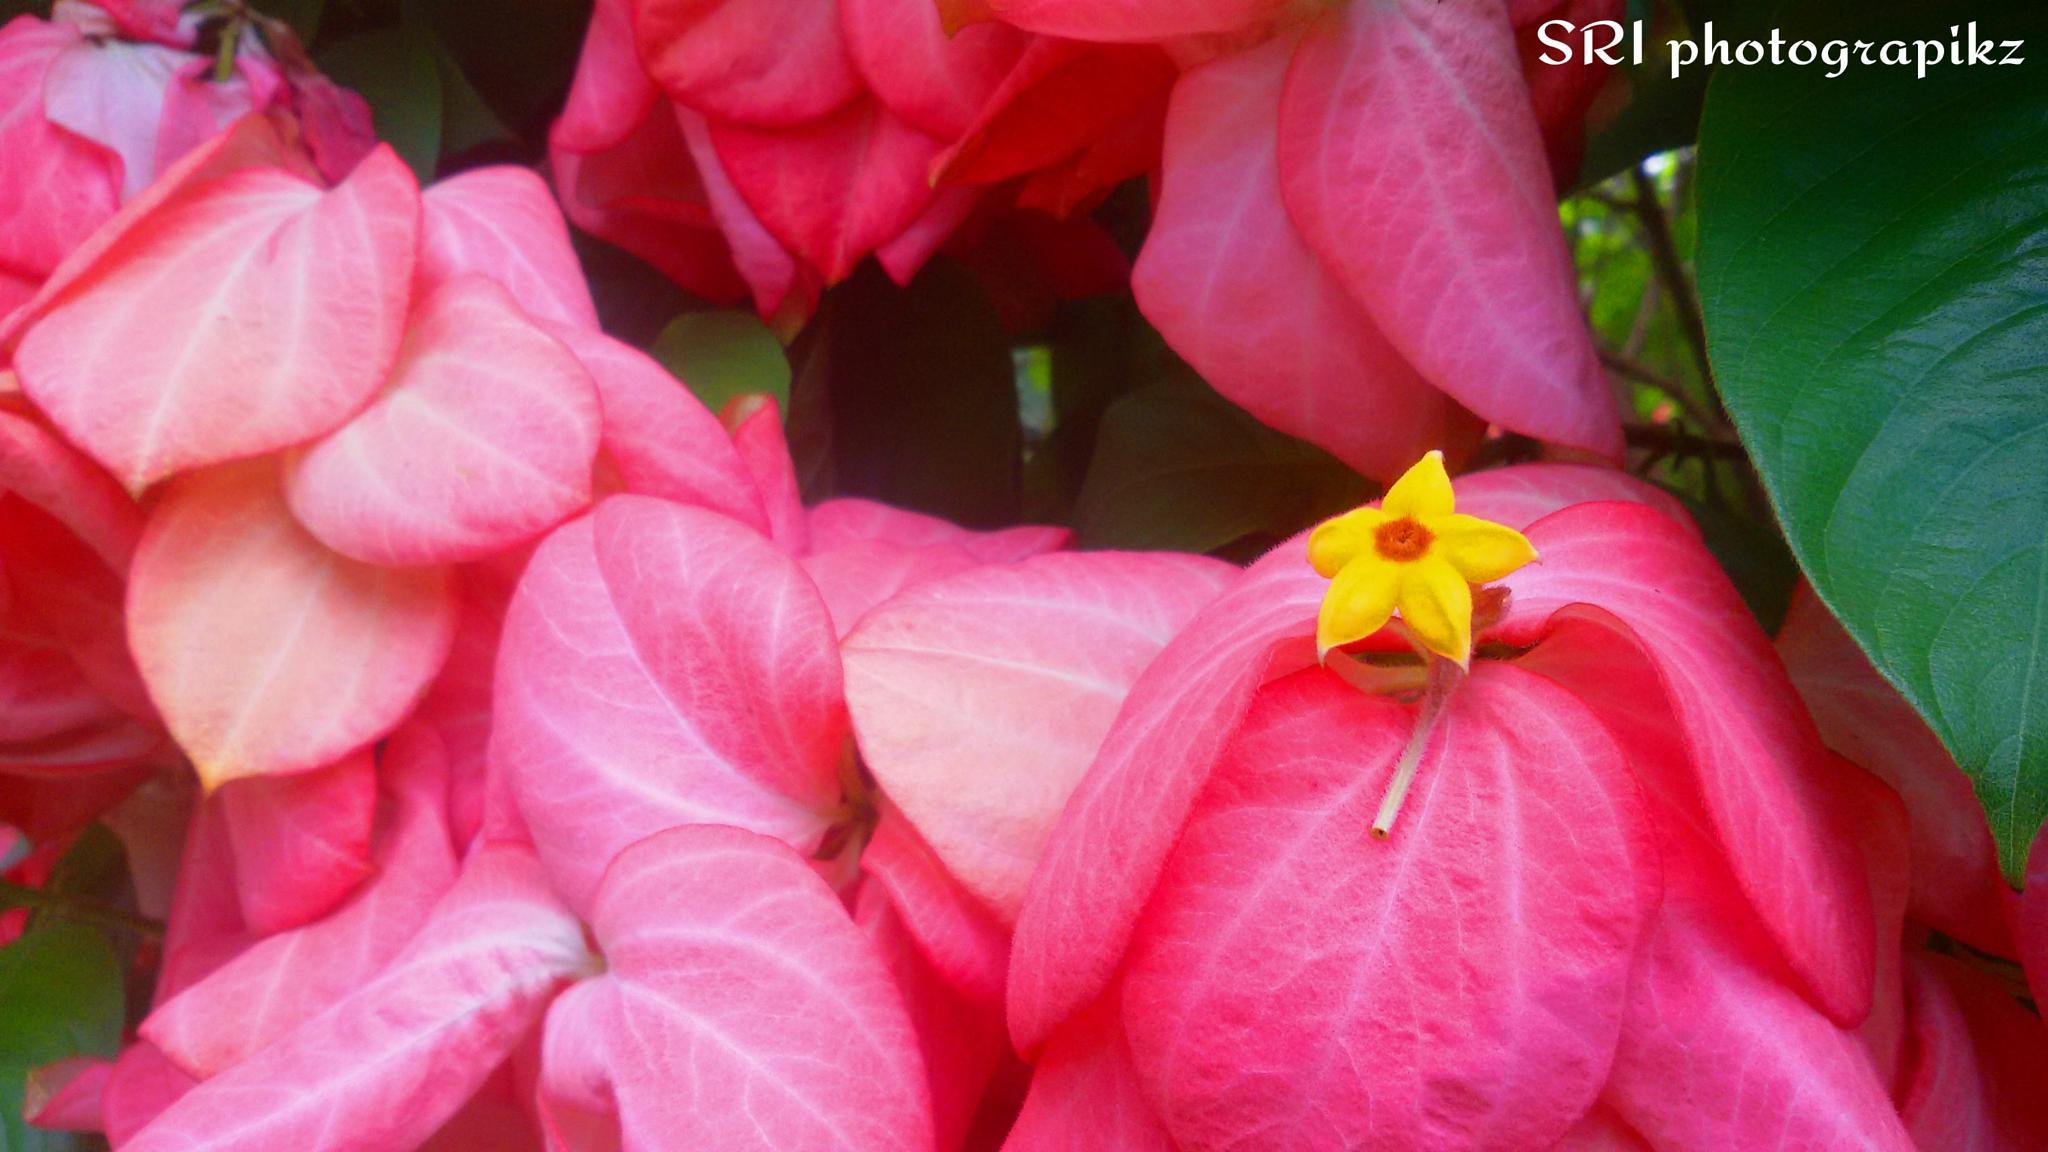 Flower by Jawahar srinath